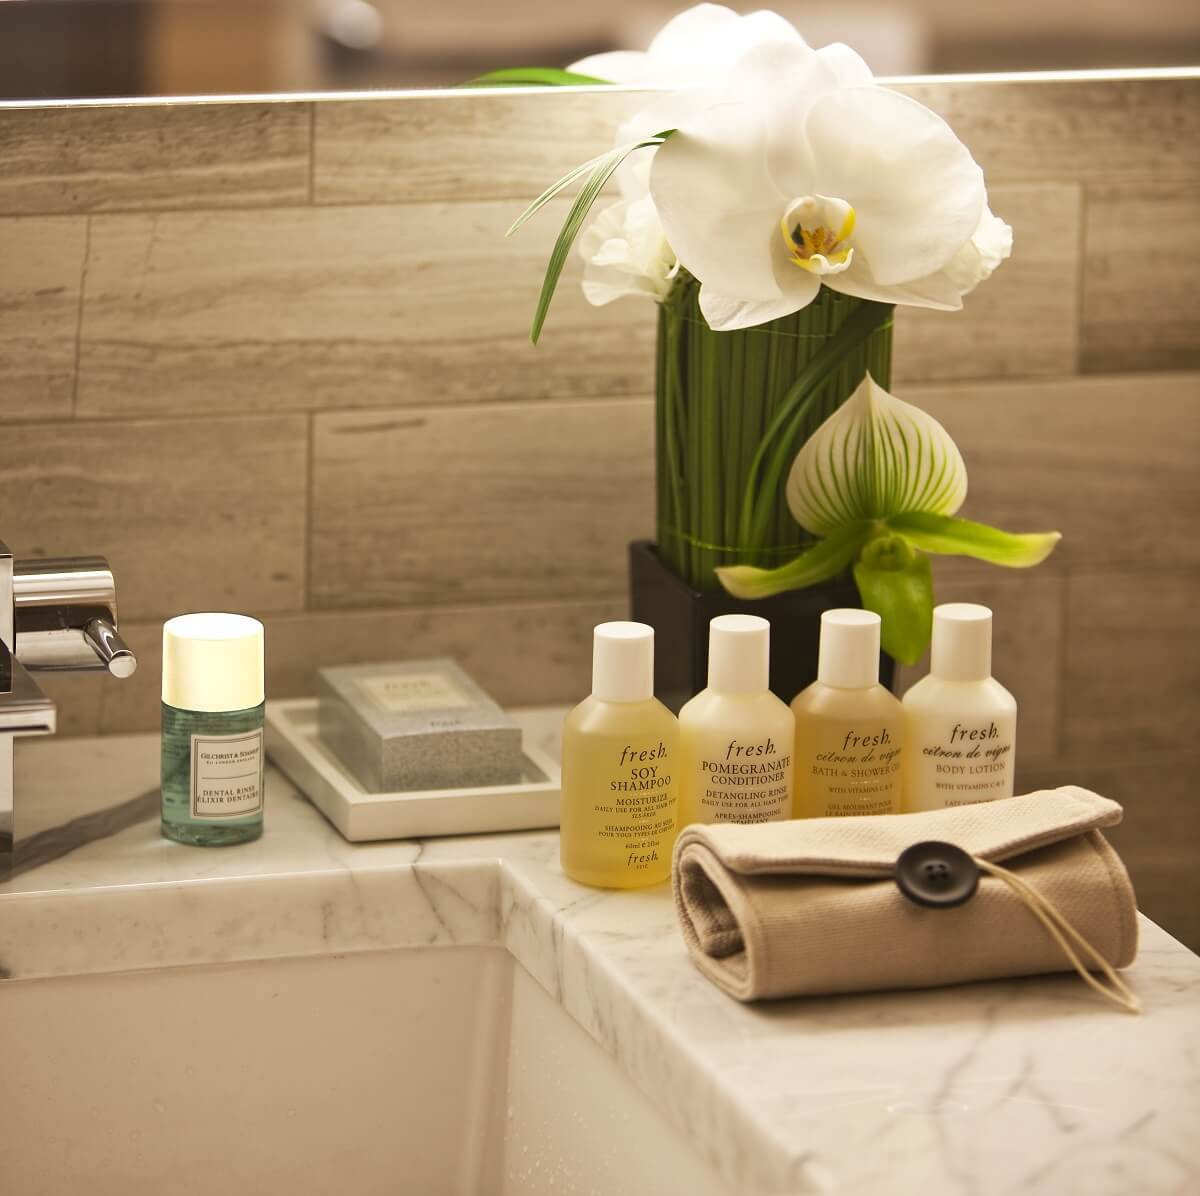 Best Hotel Toiletries in NYC